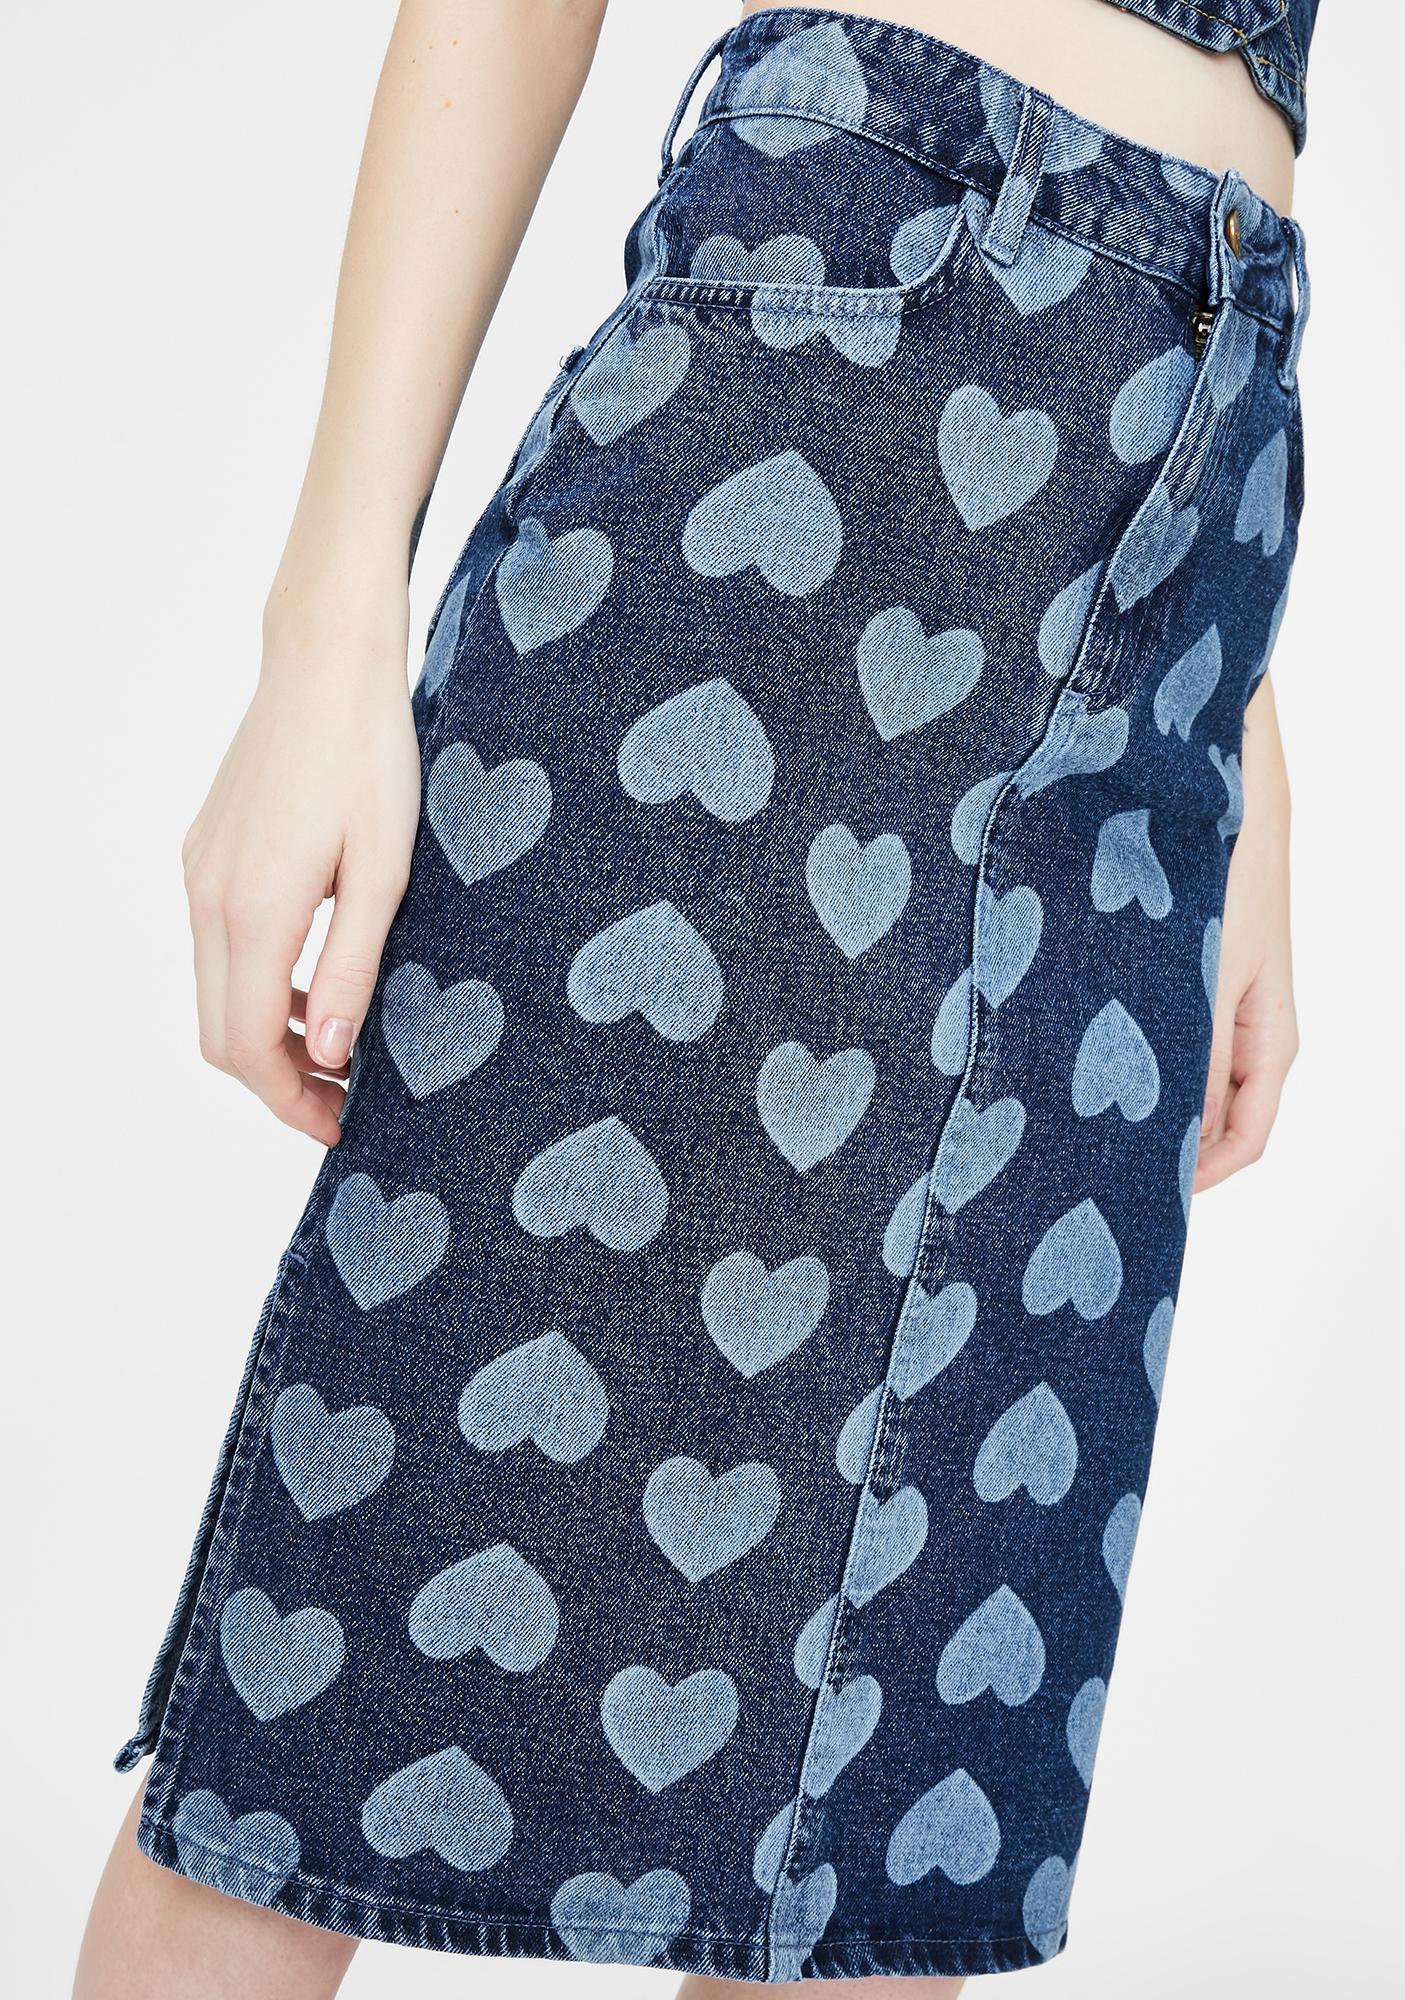 Lazy Oaf Cyber Love Denim Skirt